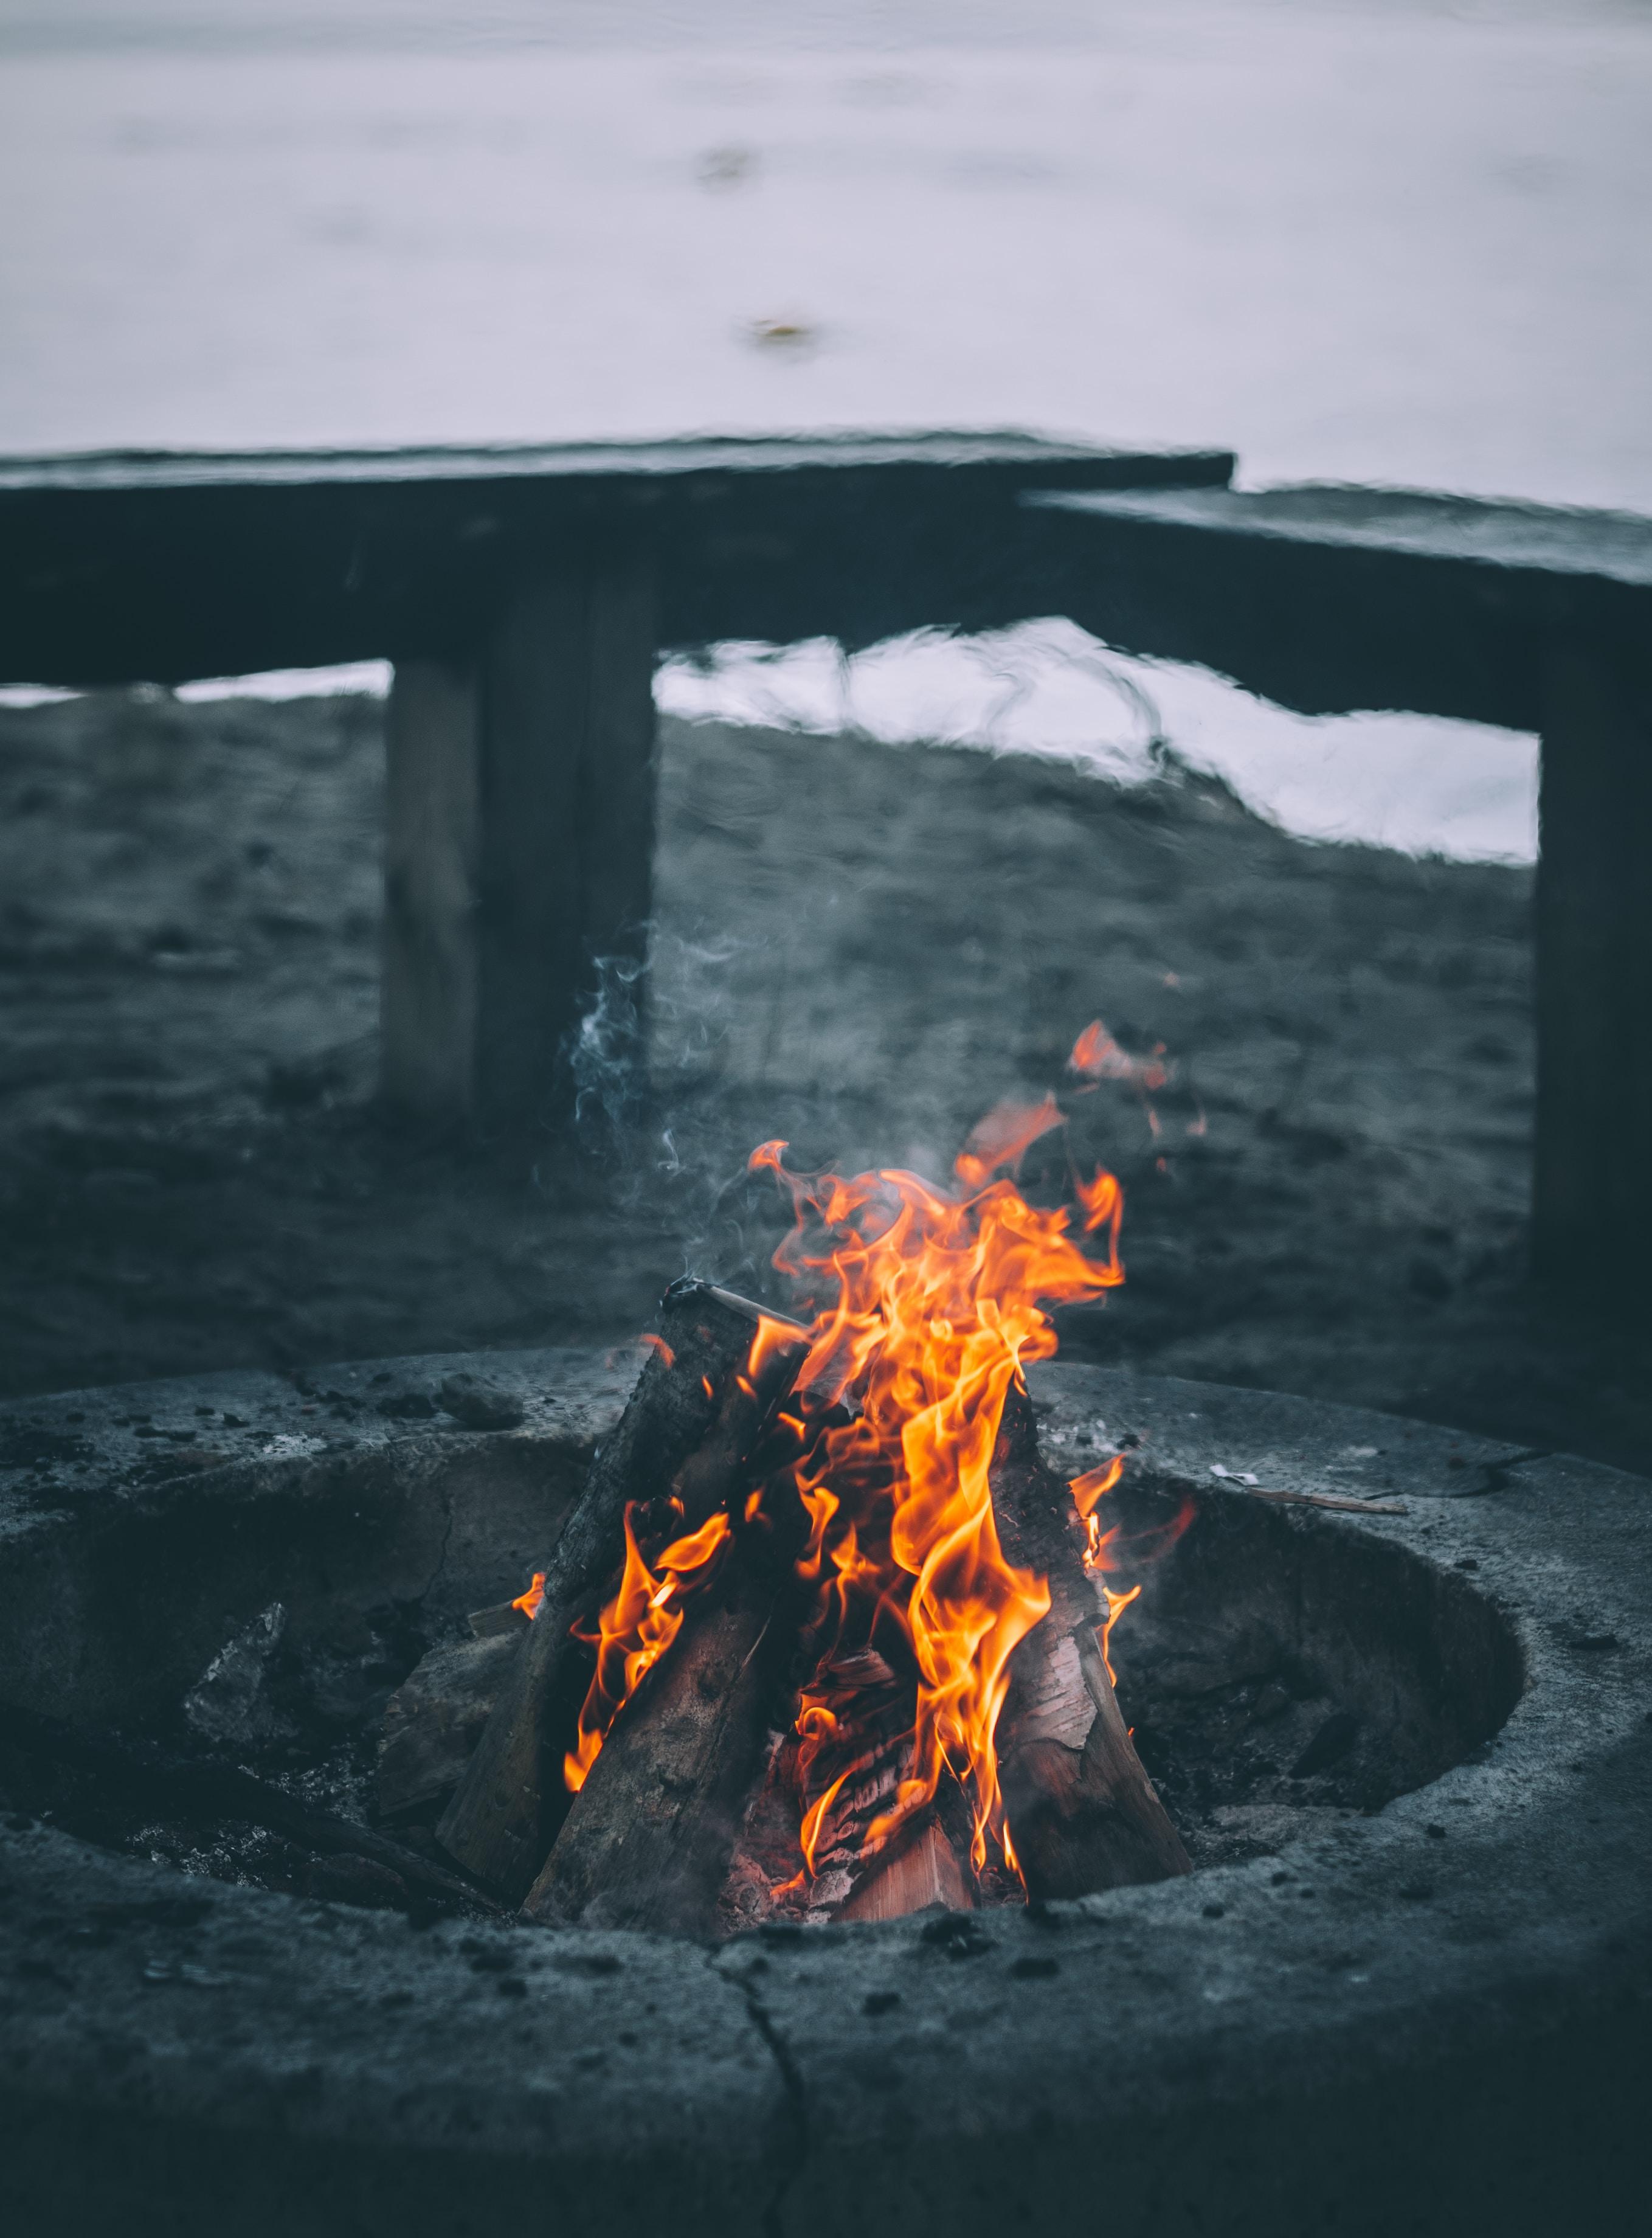 bonfire near bench and sea at daytime